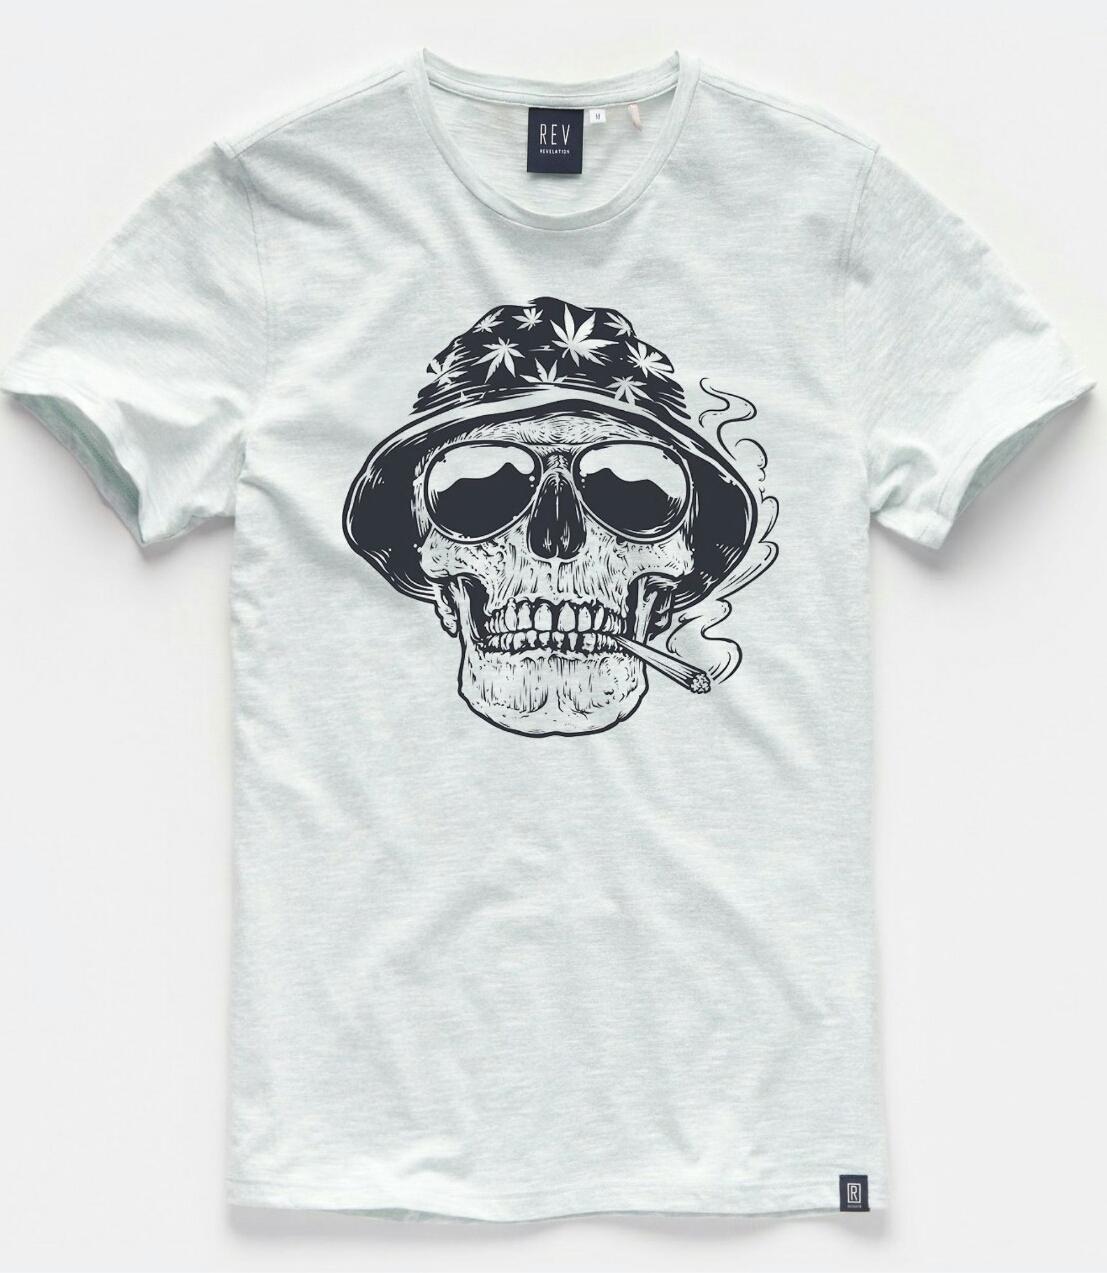 Kaos Distro Pria Wanita Friday Killer Skull   Bone Triple D ... f47e05cc79